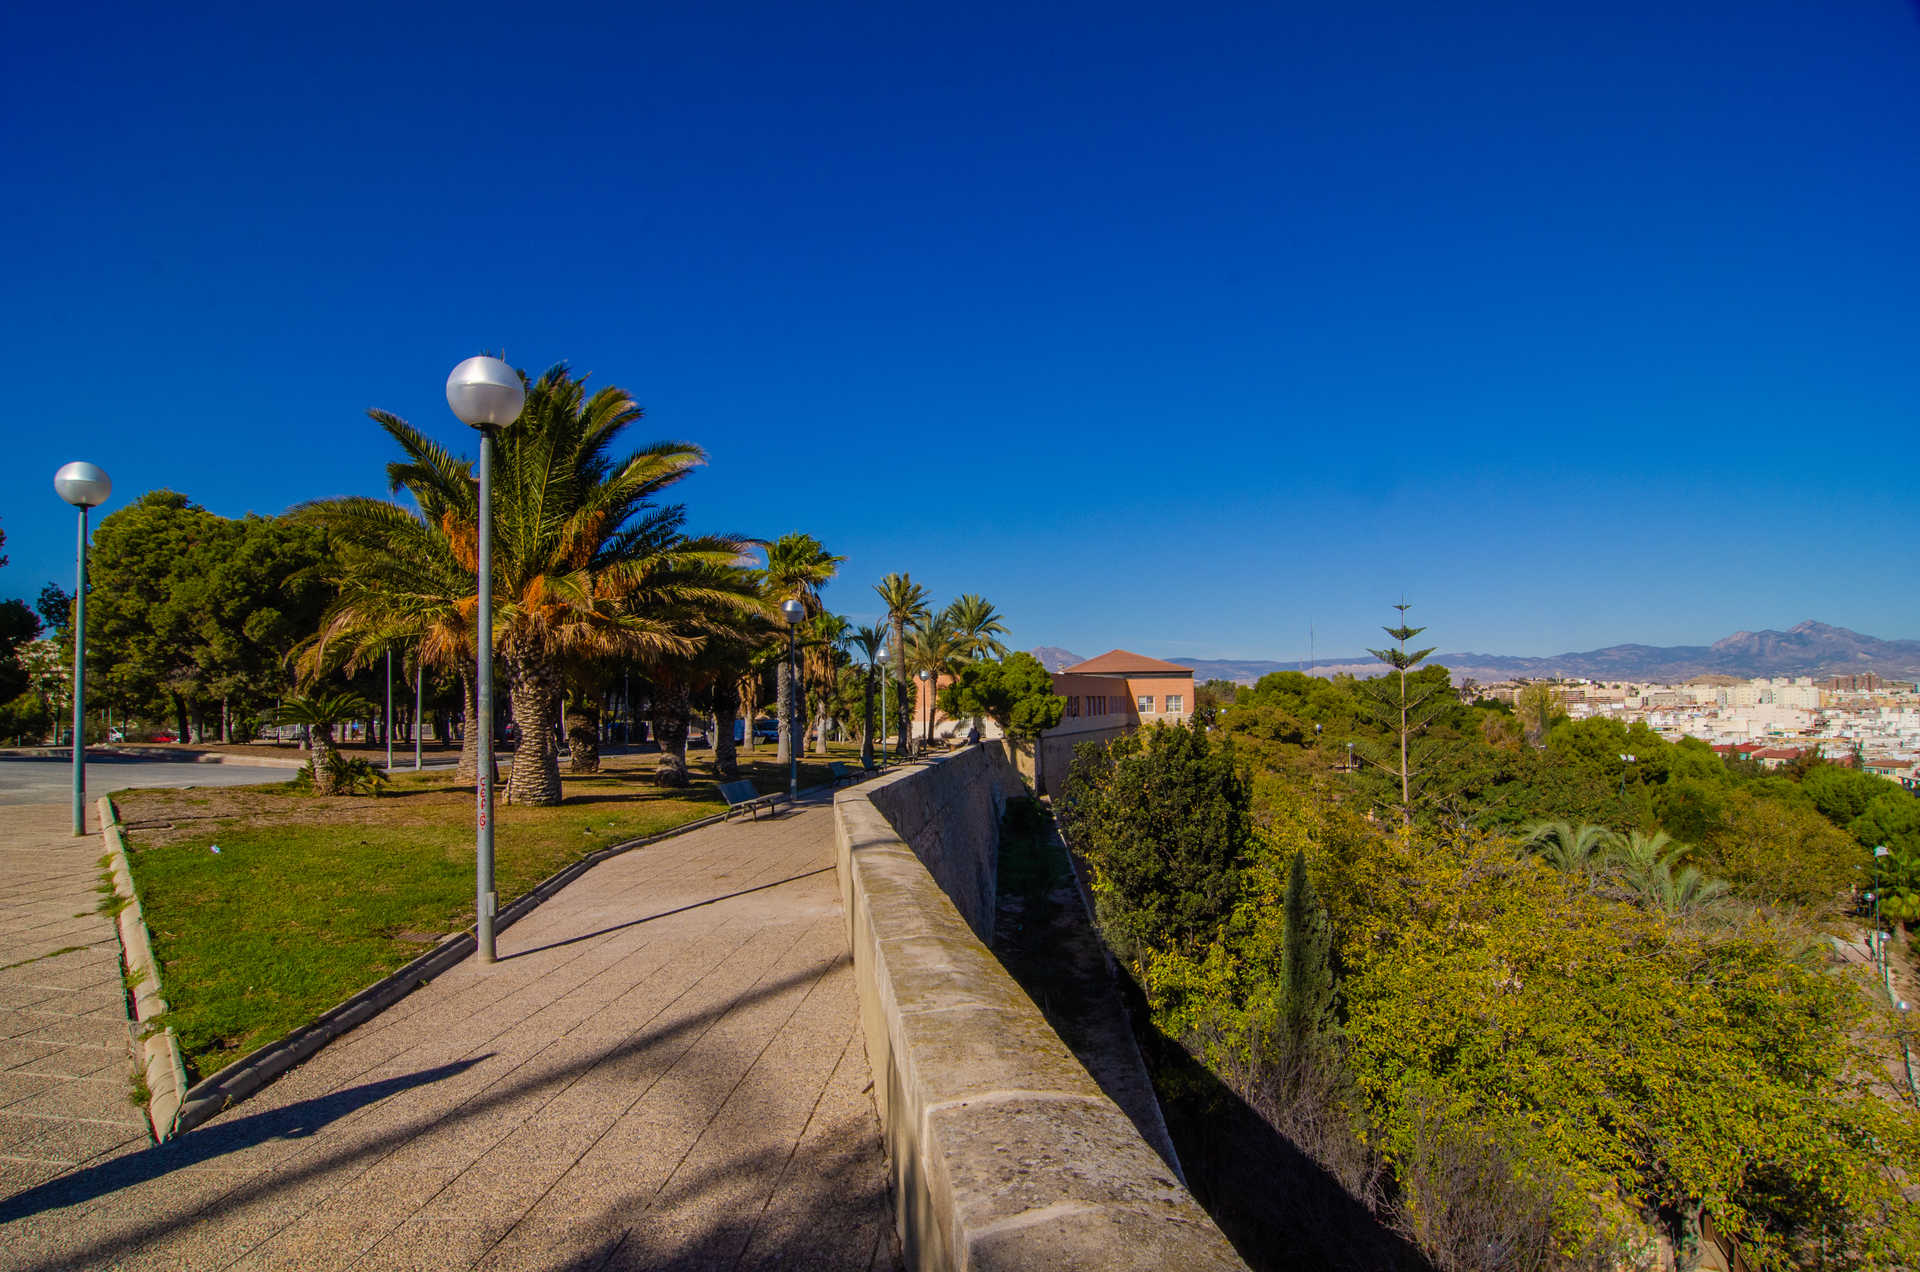 Parque Monte Tossal